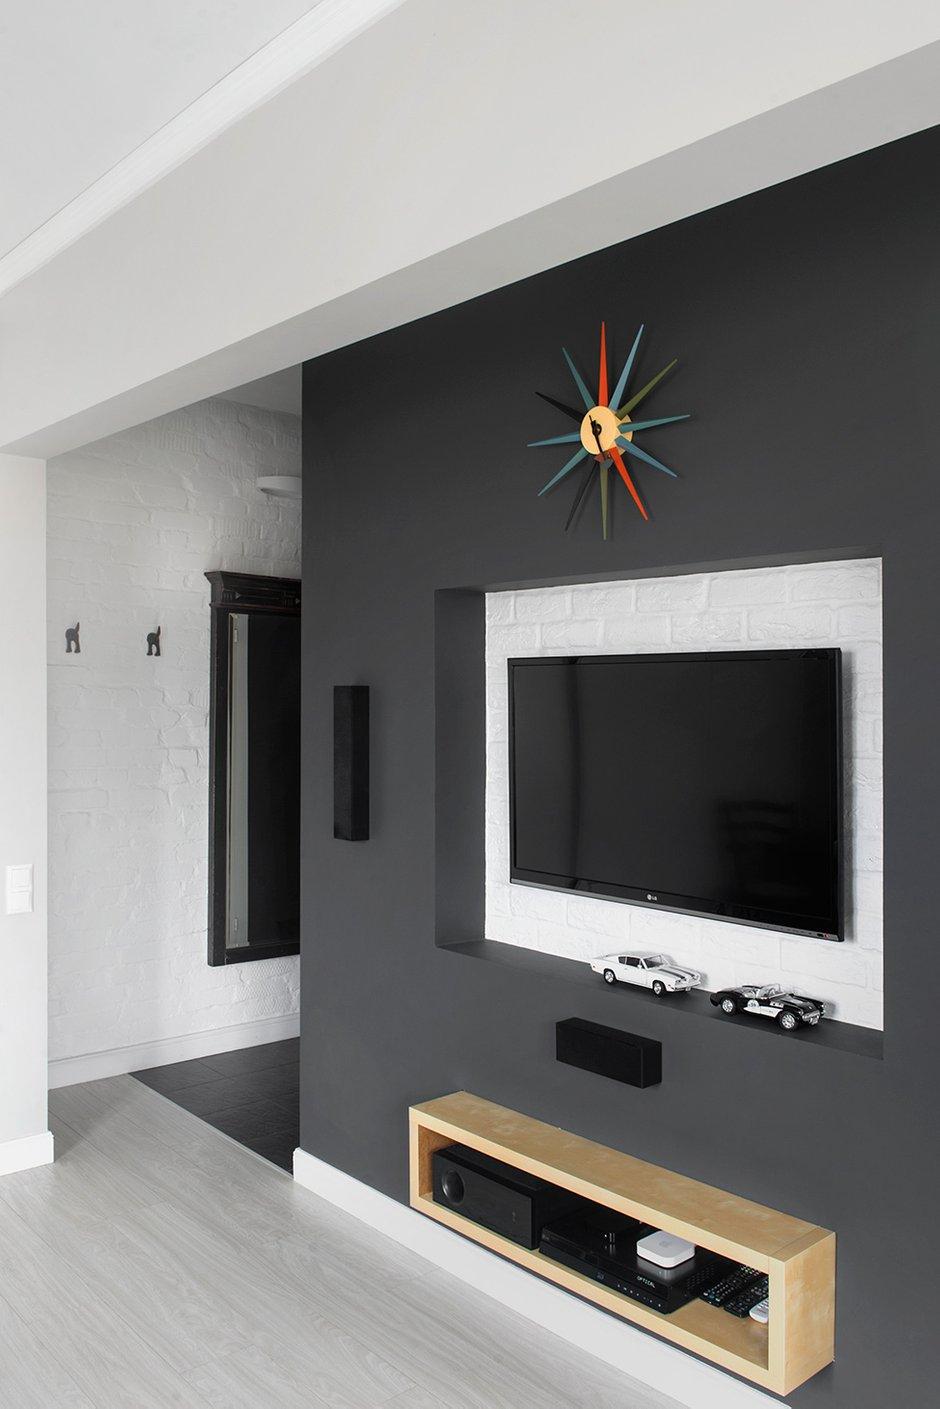 Фотография: Декор в стиле Современный, Малогабаритная квартира, Квартира, Дома и квартиры, IKEA, Проект недели, Хрущевка – фото на INMYROOM